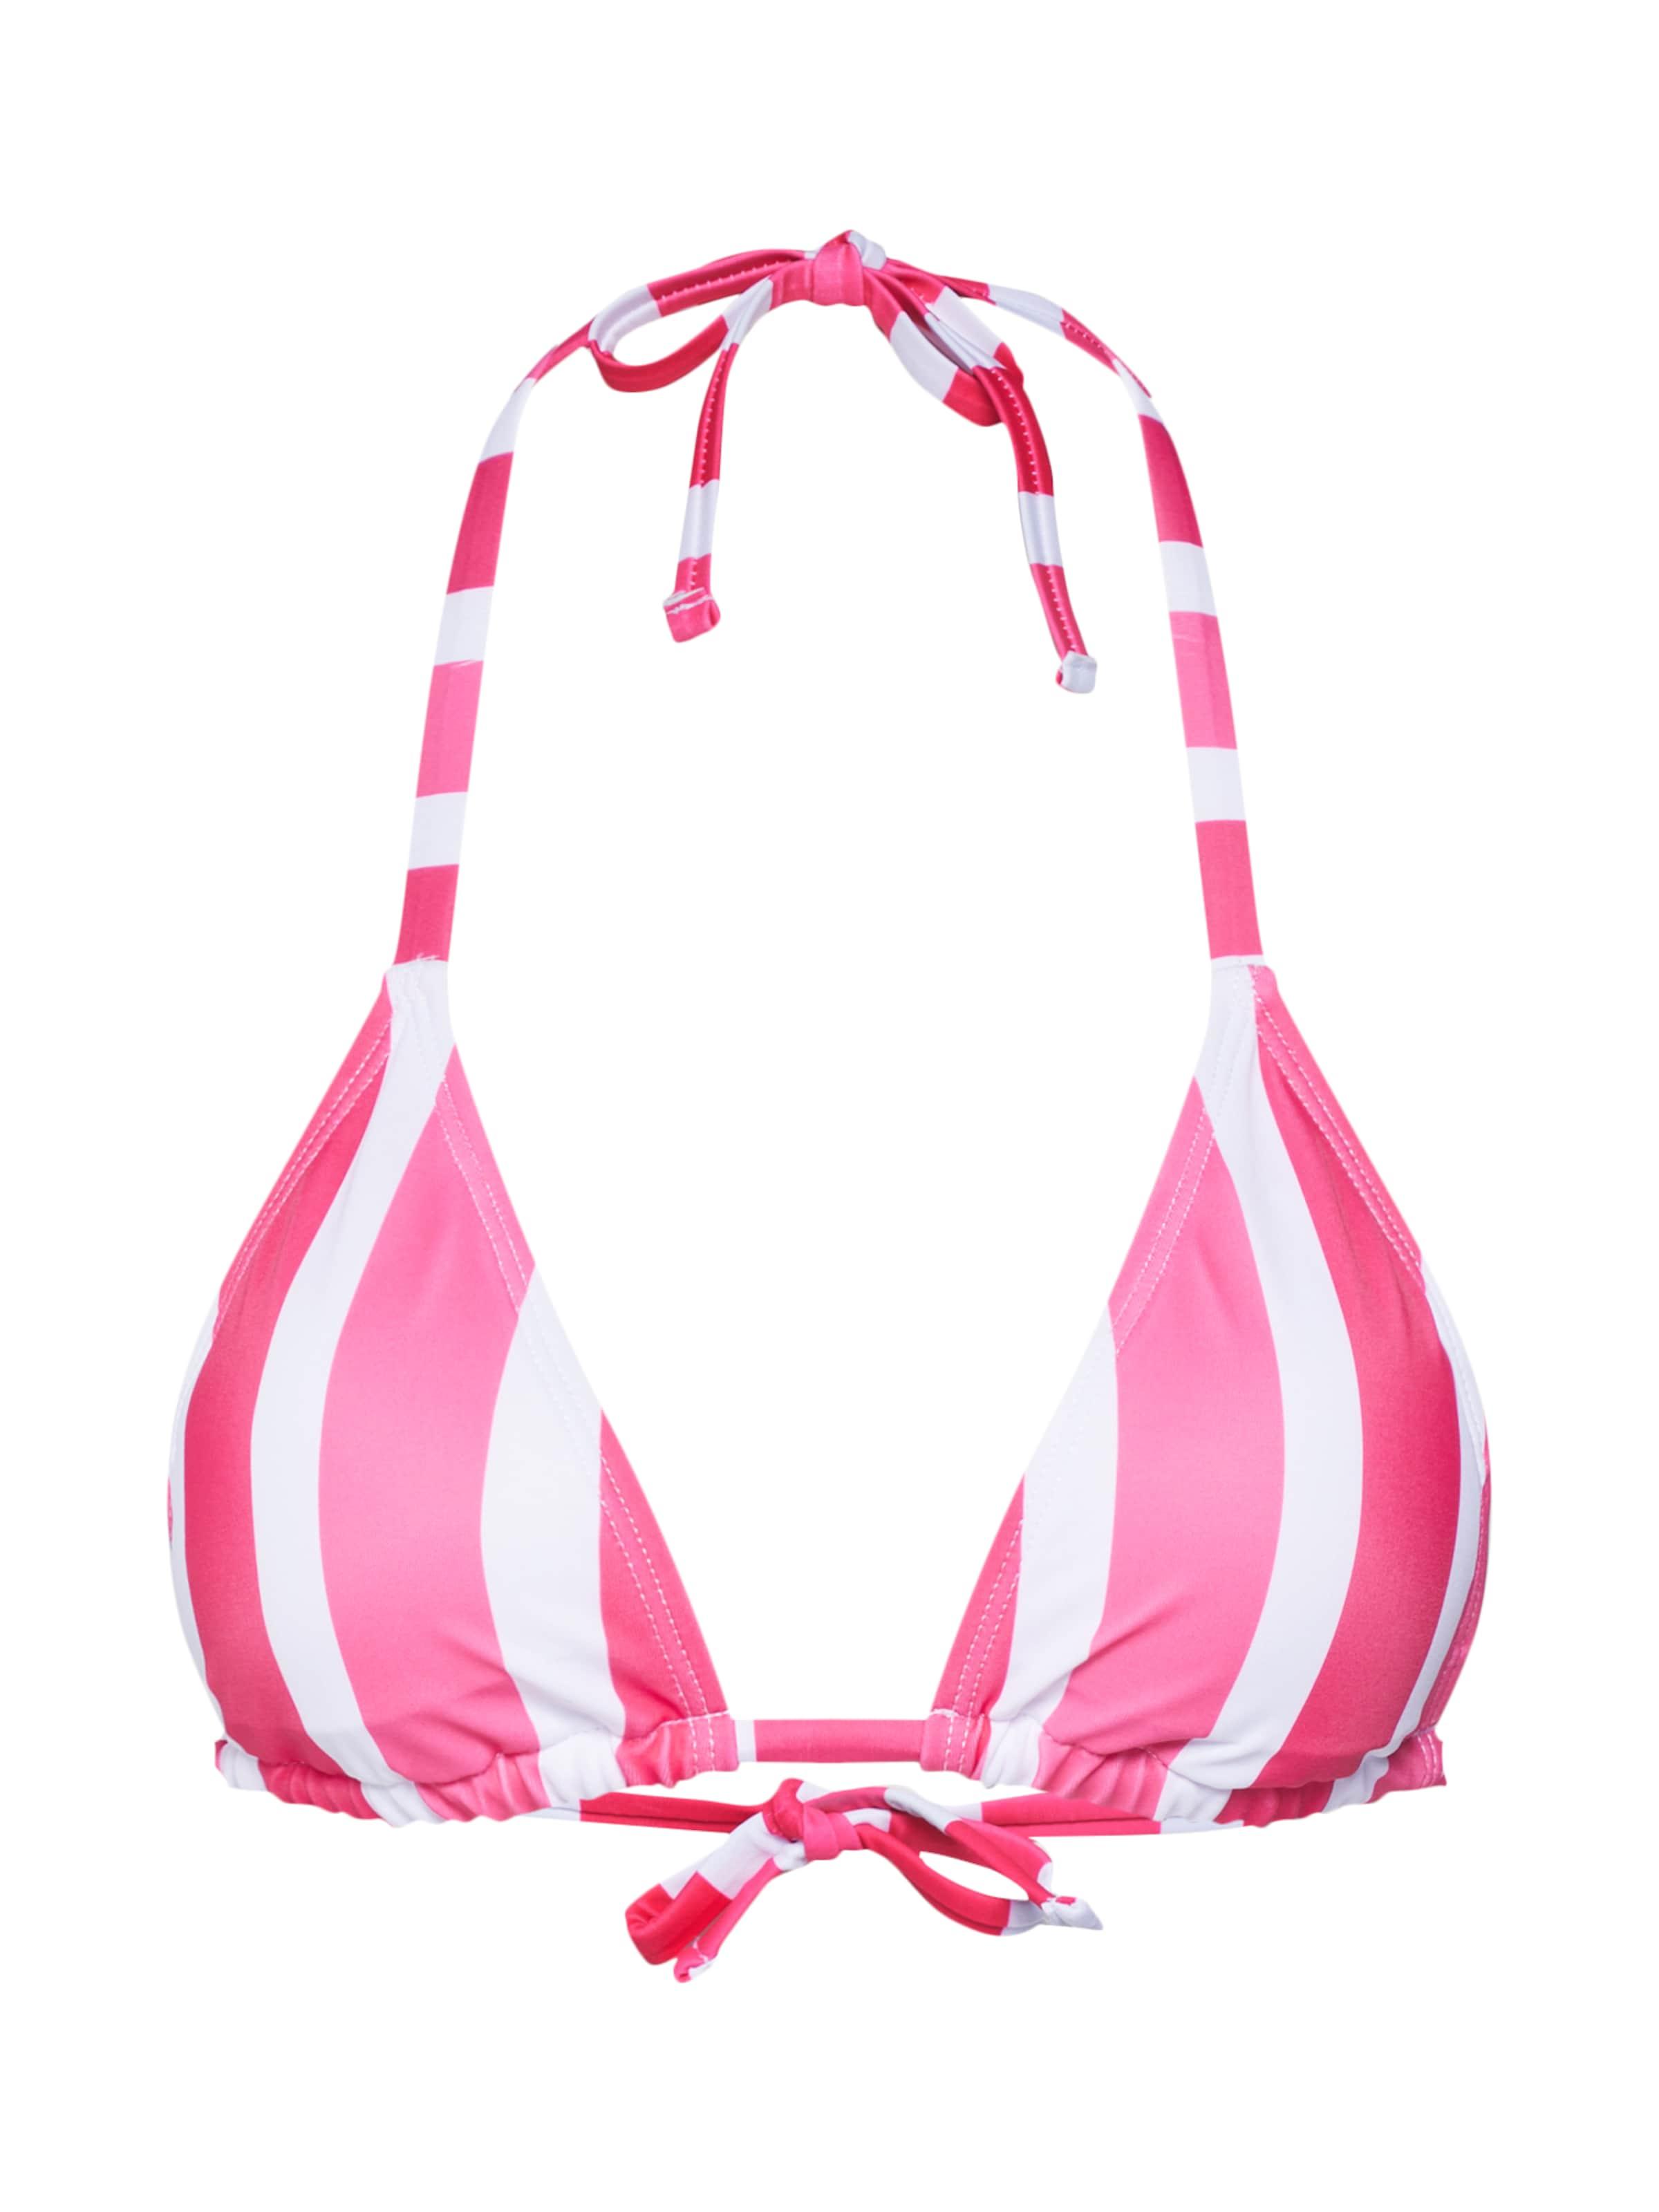 En RoseBlanc Bikini Hunkemöller De Triangle' 'candy Hauts Stripes ukZPXi